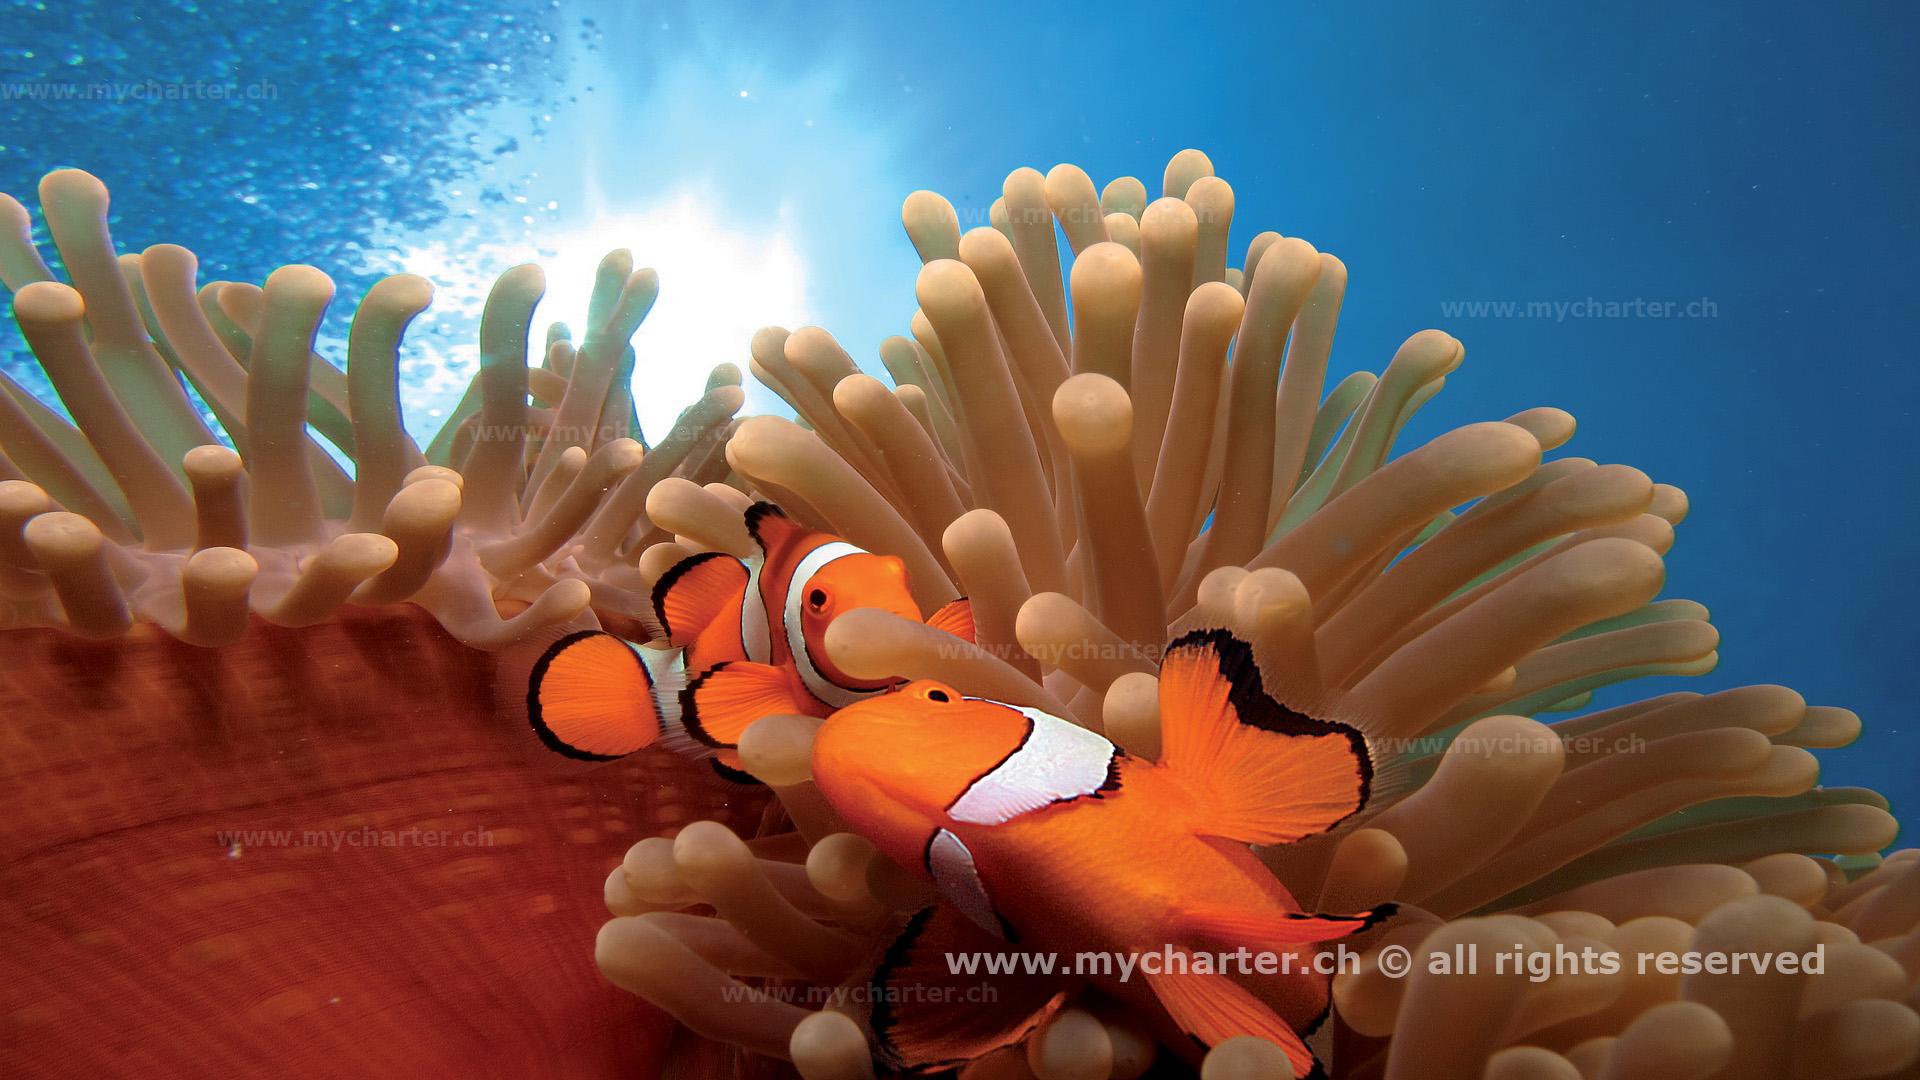 Yachtcharter Südesee - Australien - Clown Fisch